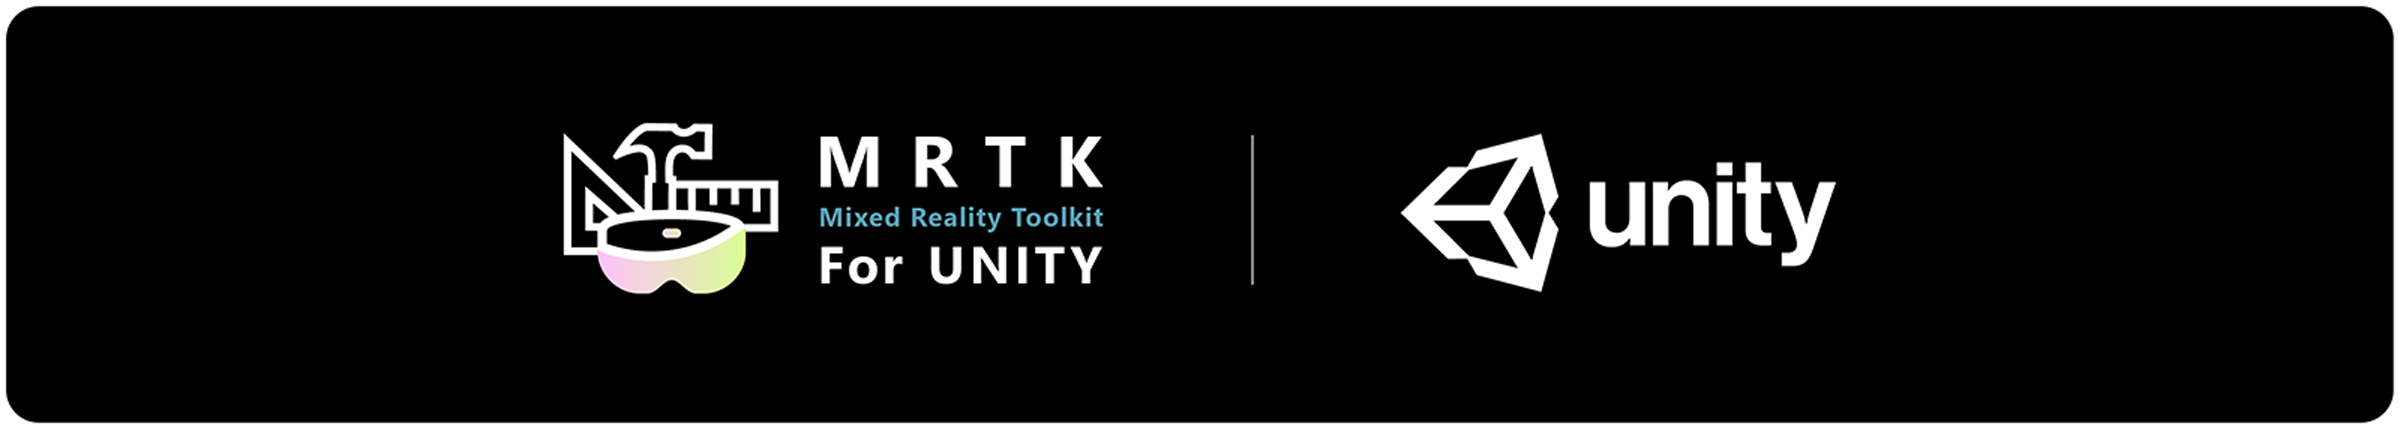 Logo_MRTK_Unity_Banner.png